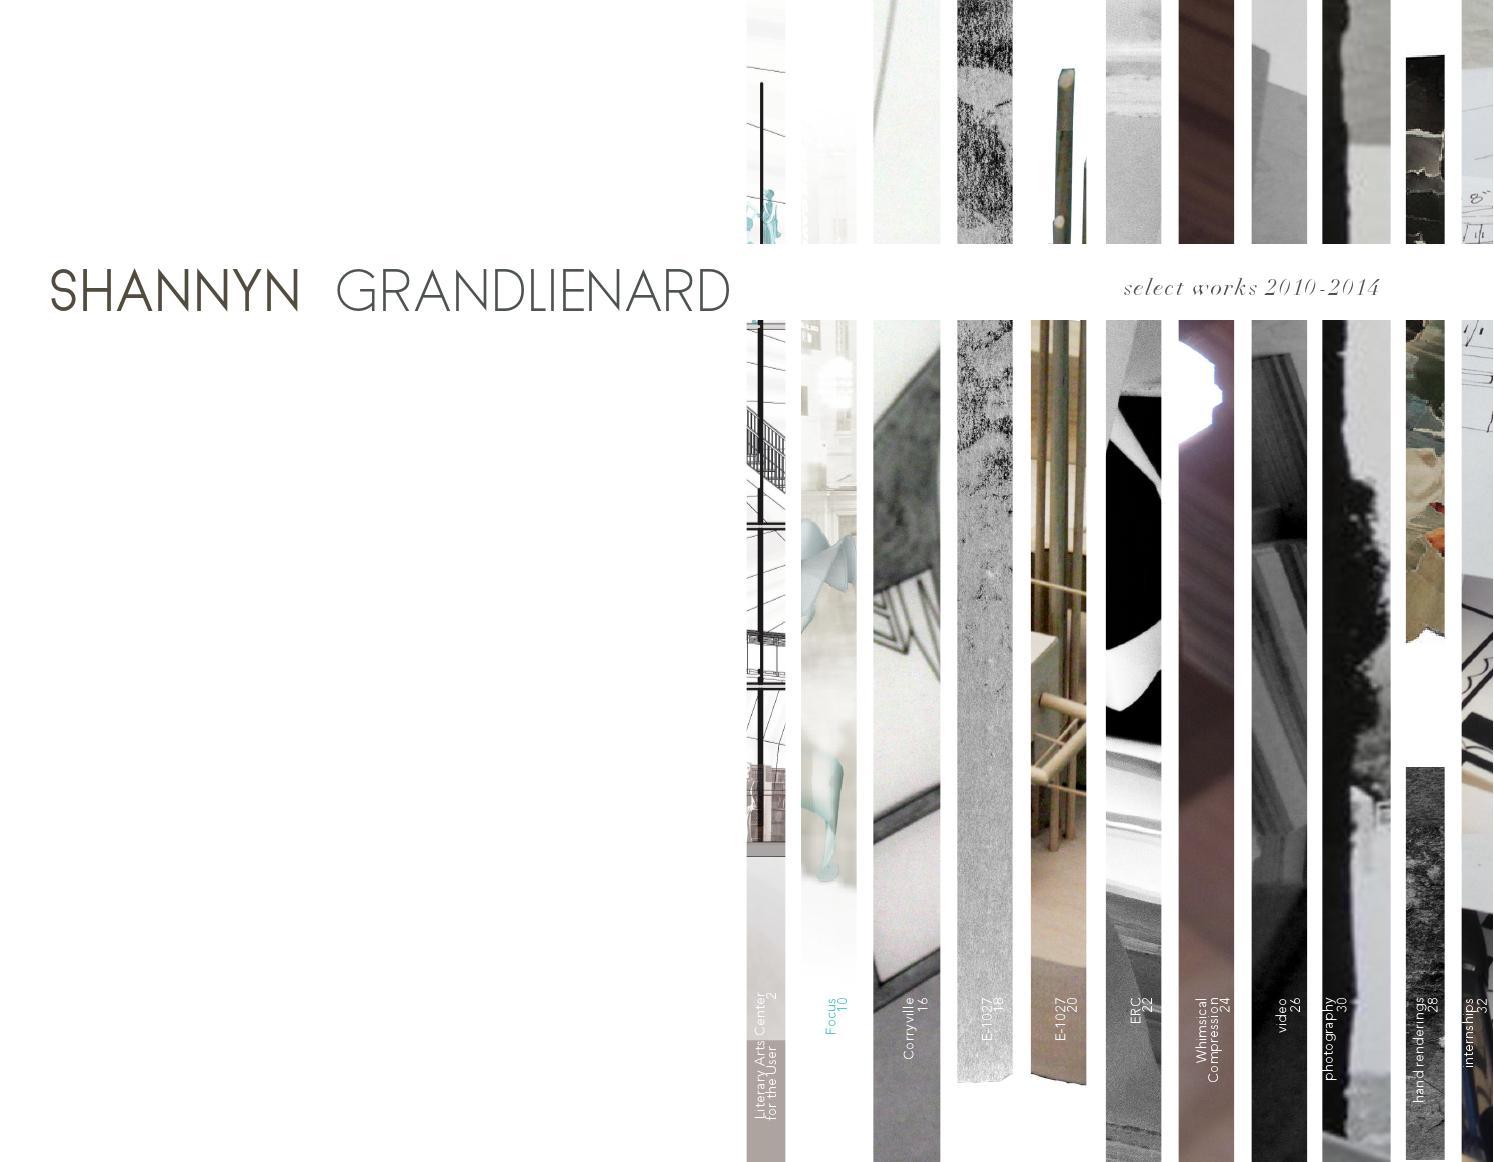 Shannyn grandlienard interior design portfolio by shannyn Fit interior design portfolio